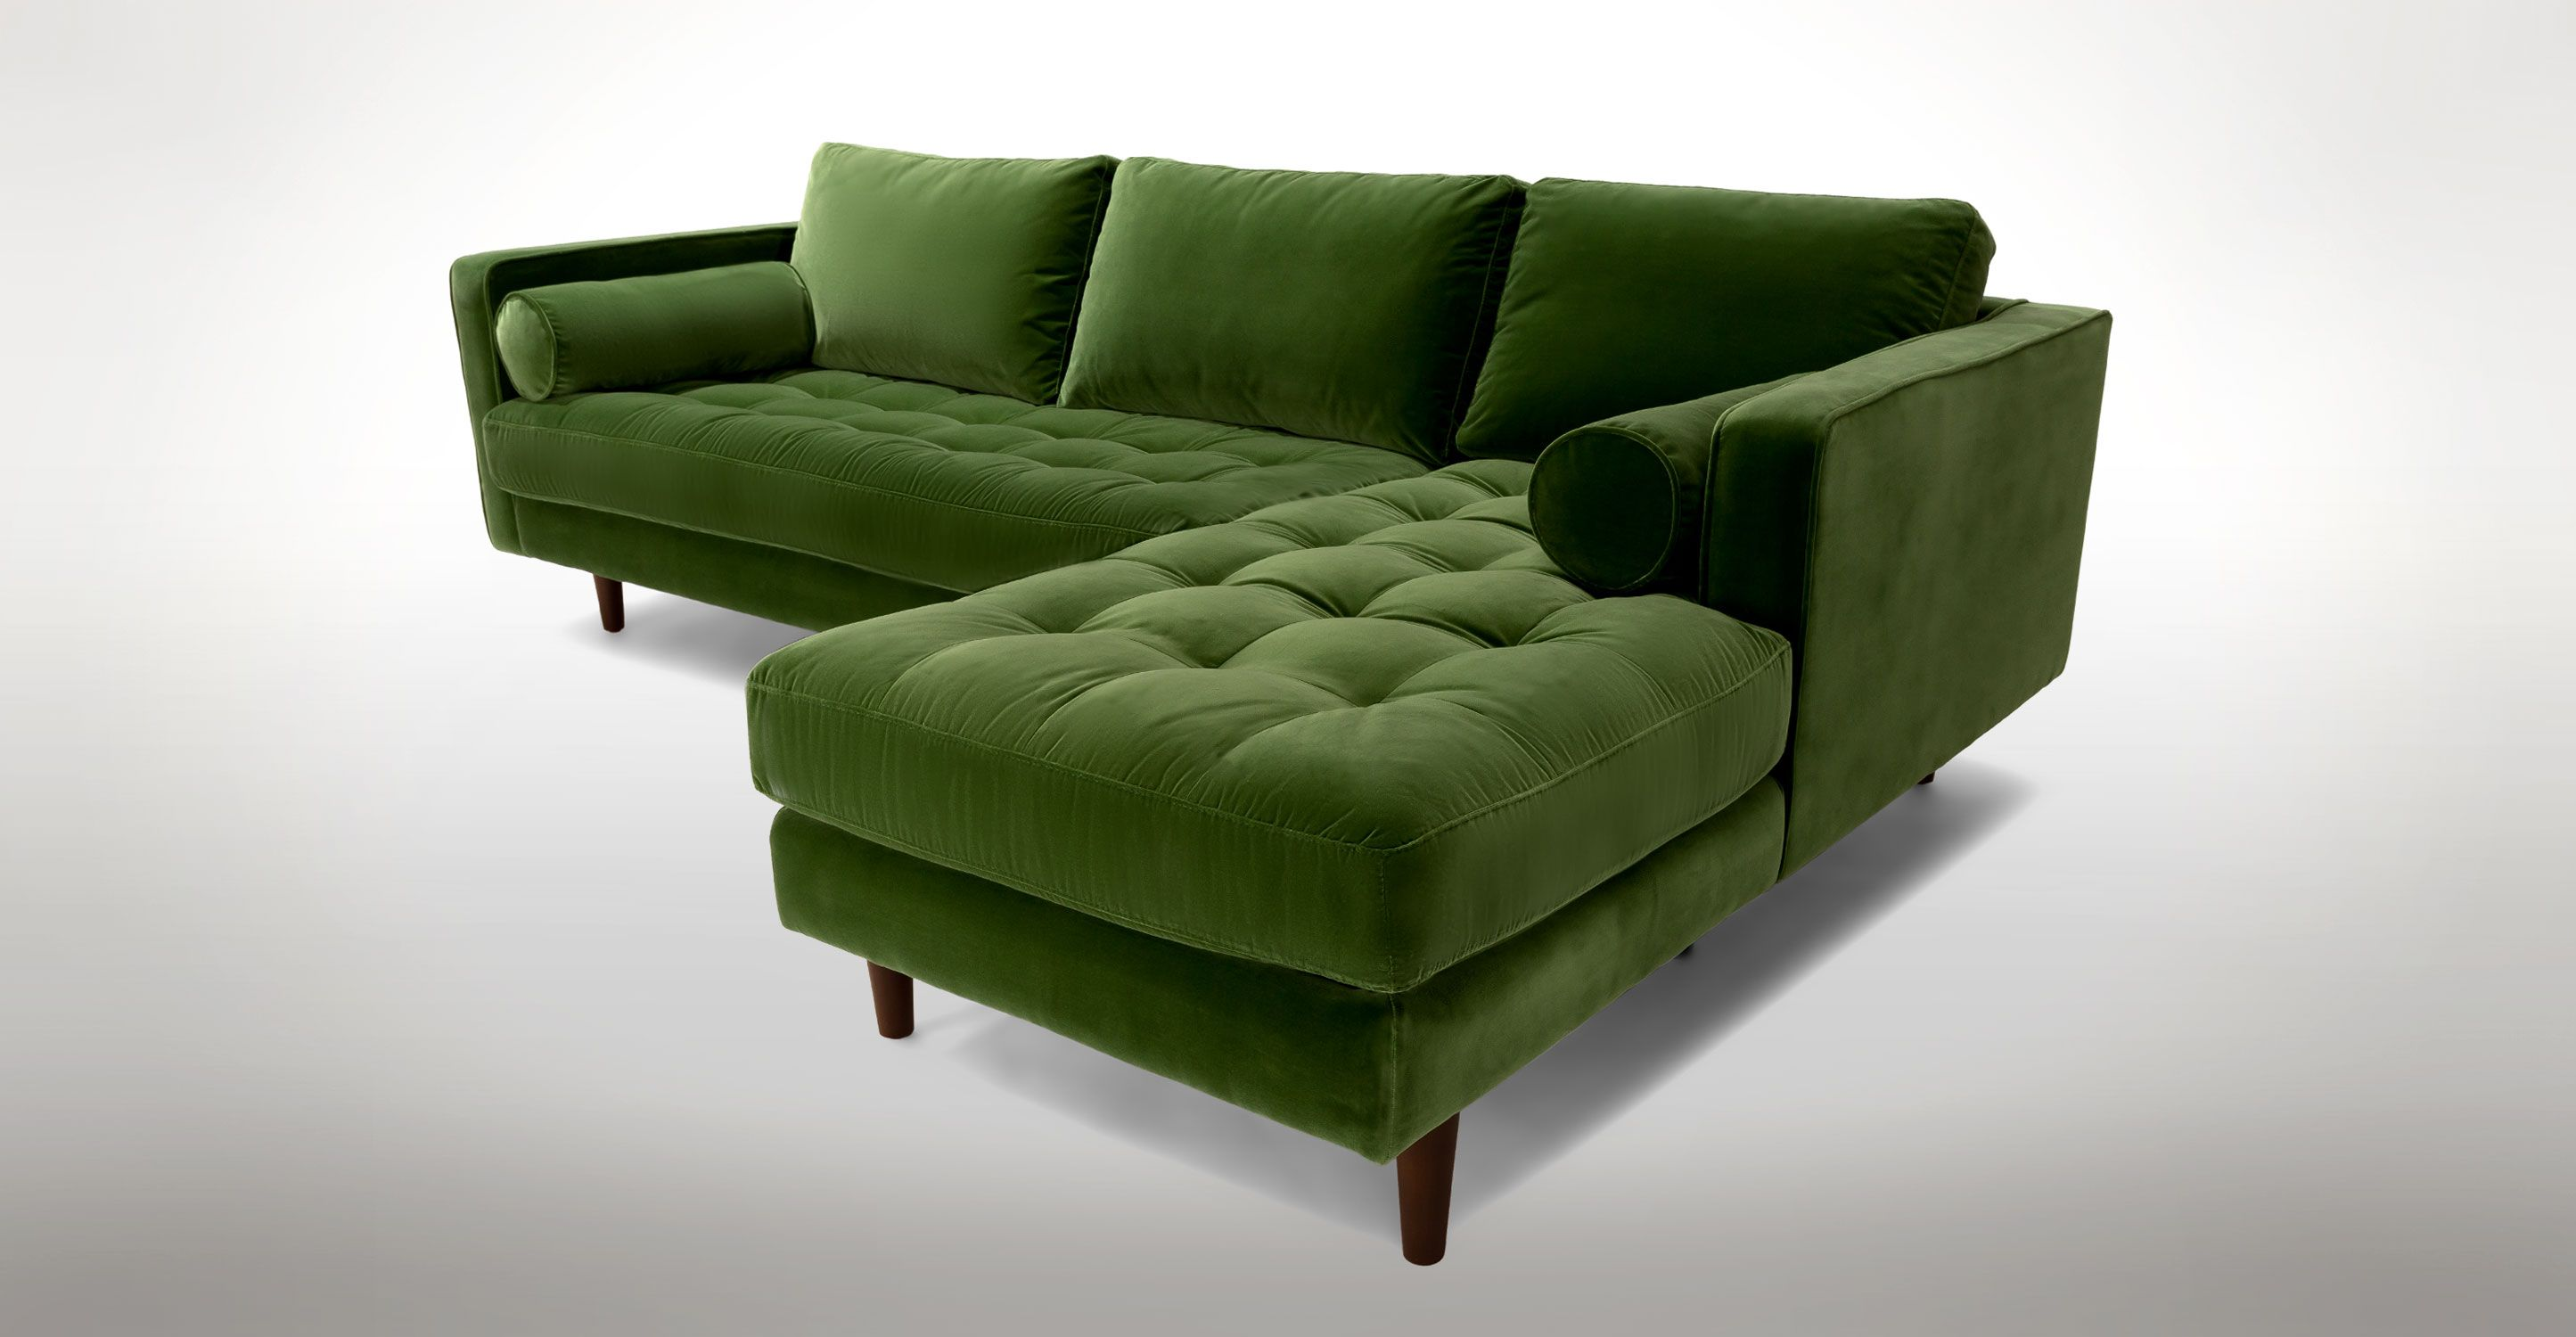 Sofa Article Xv Grey Colour Schemes Green Velvet Right Sectional Tufted Sven